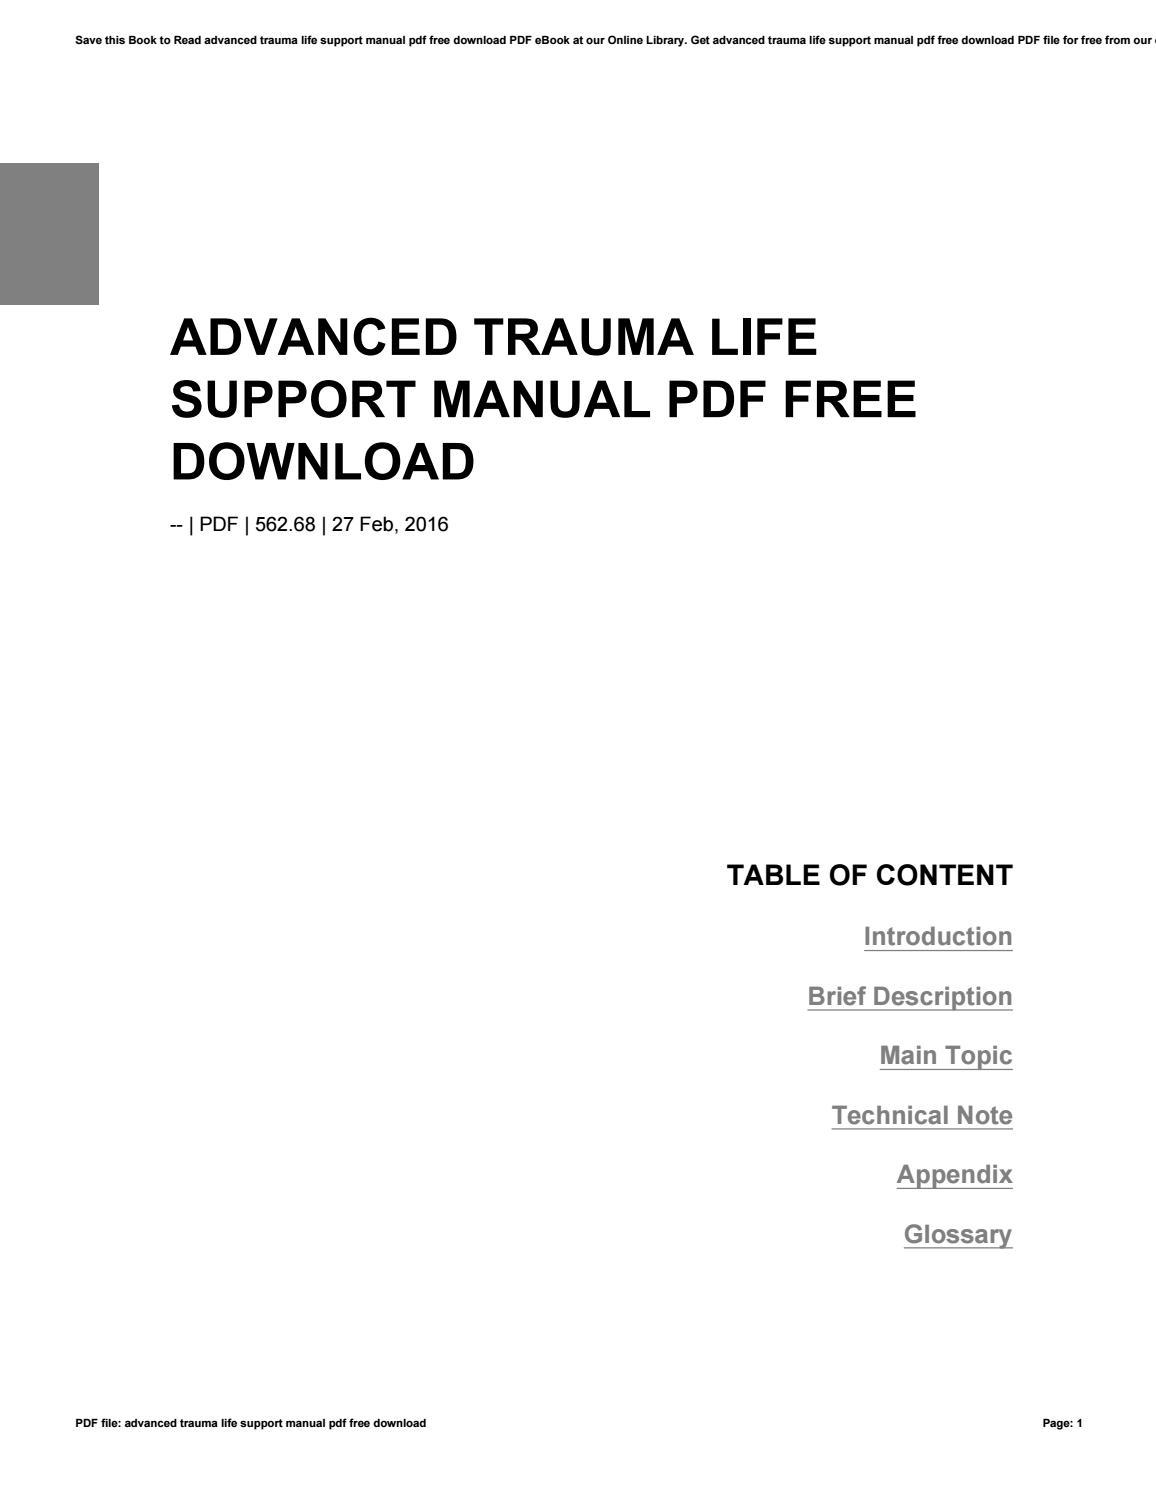 Advanced trauma life support manual pdf free download by mailfs284 - issuu